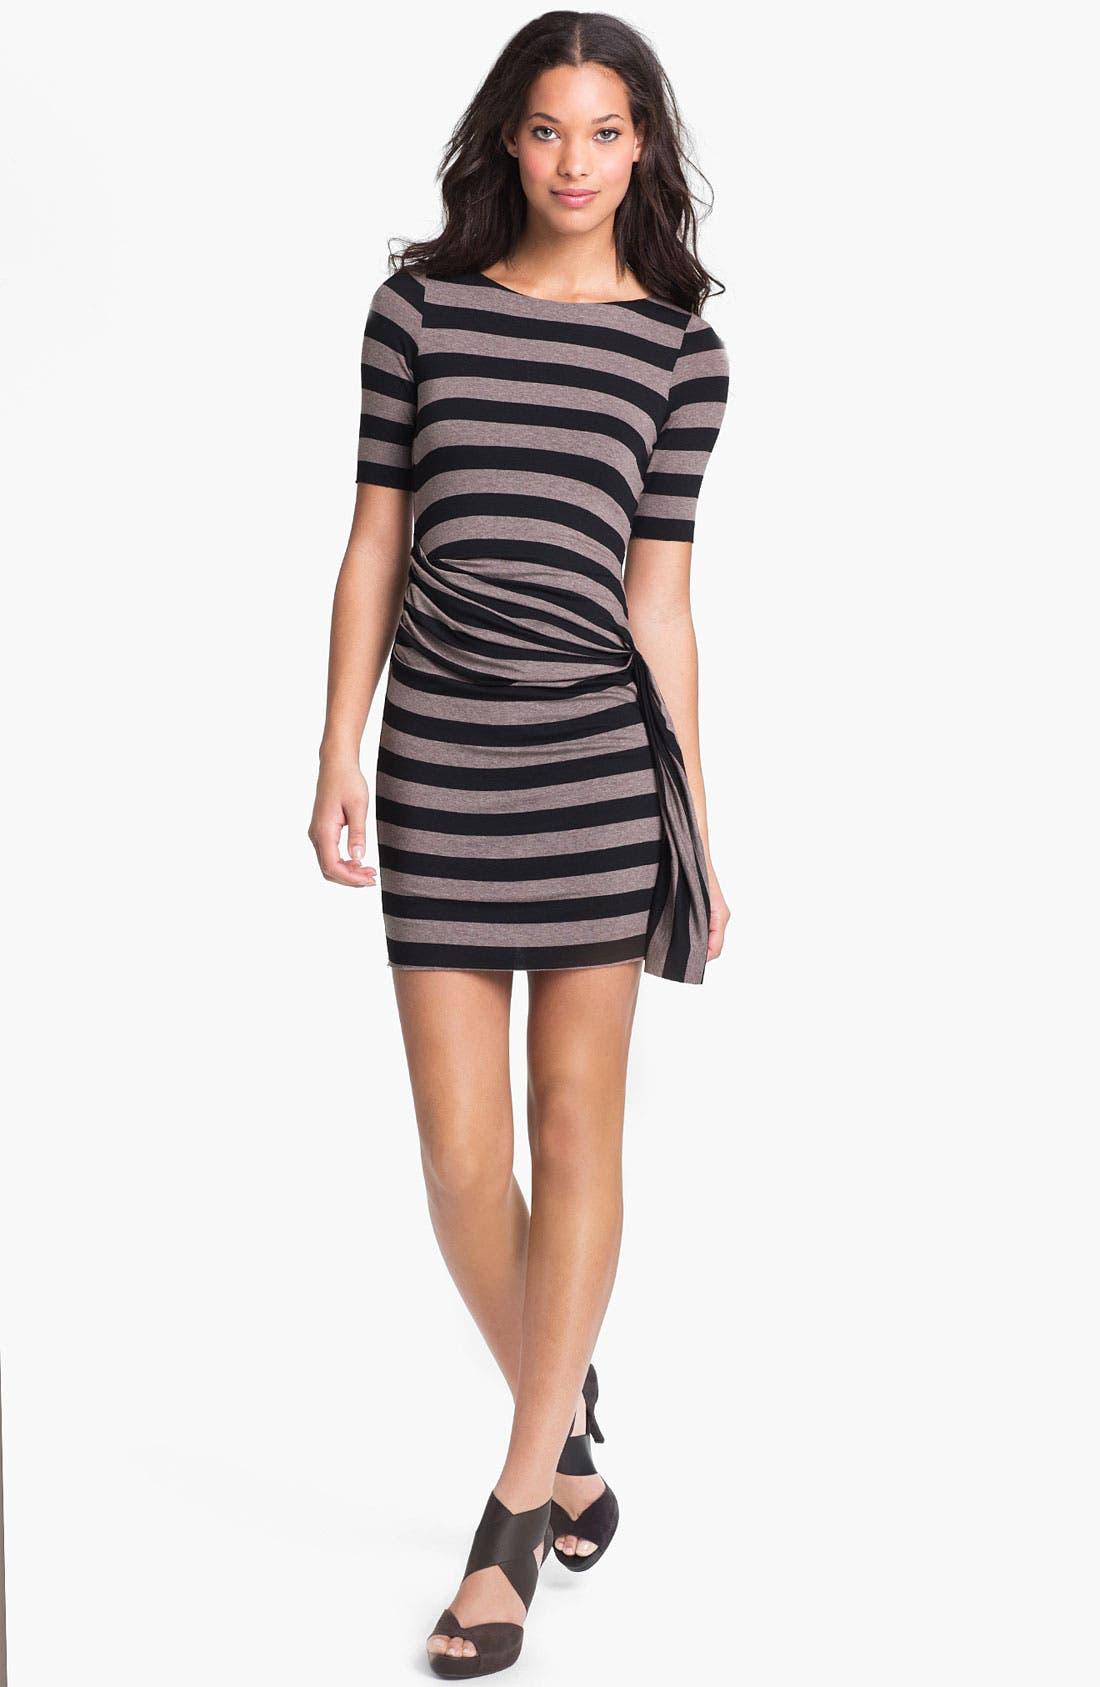 Alternate Image 1 Selected - Bailey 44 'Delphi' Drape Detail Stripe Dress